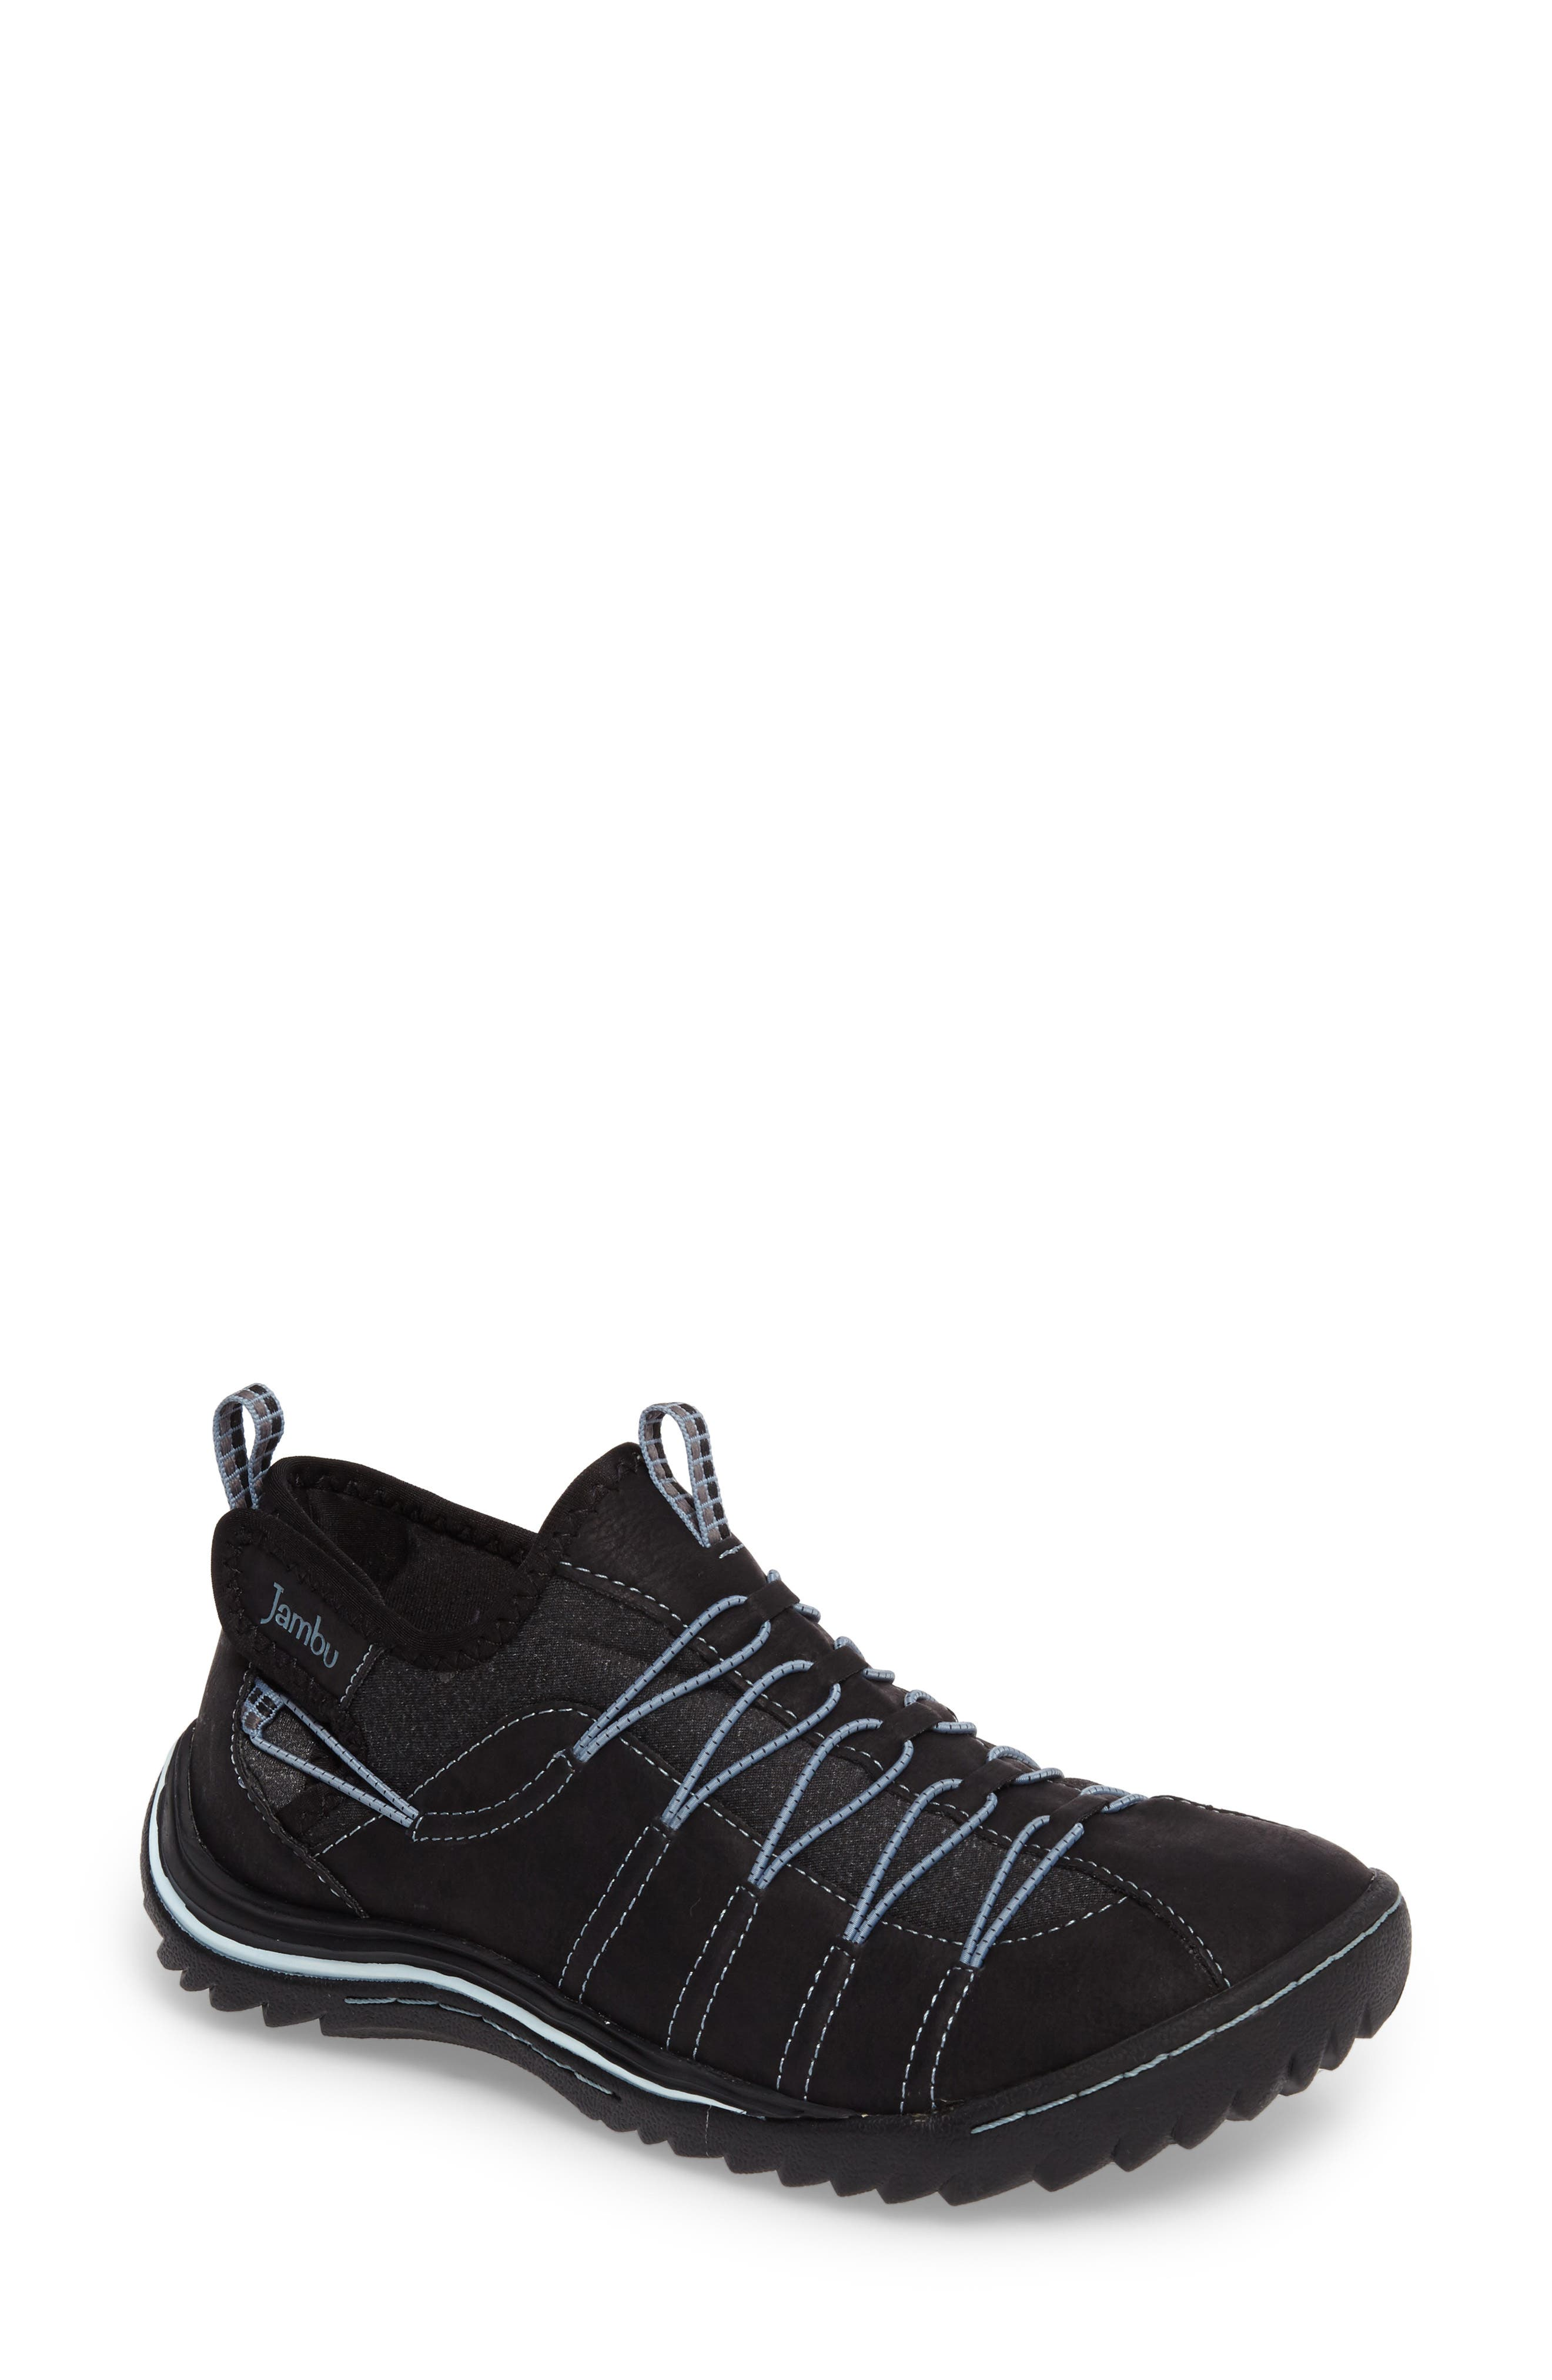 Spirit Sneaker,                         Main,                         color, Black/ Blue Smoke Leather